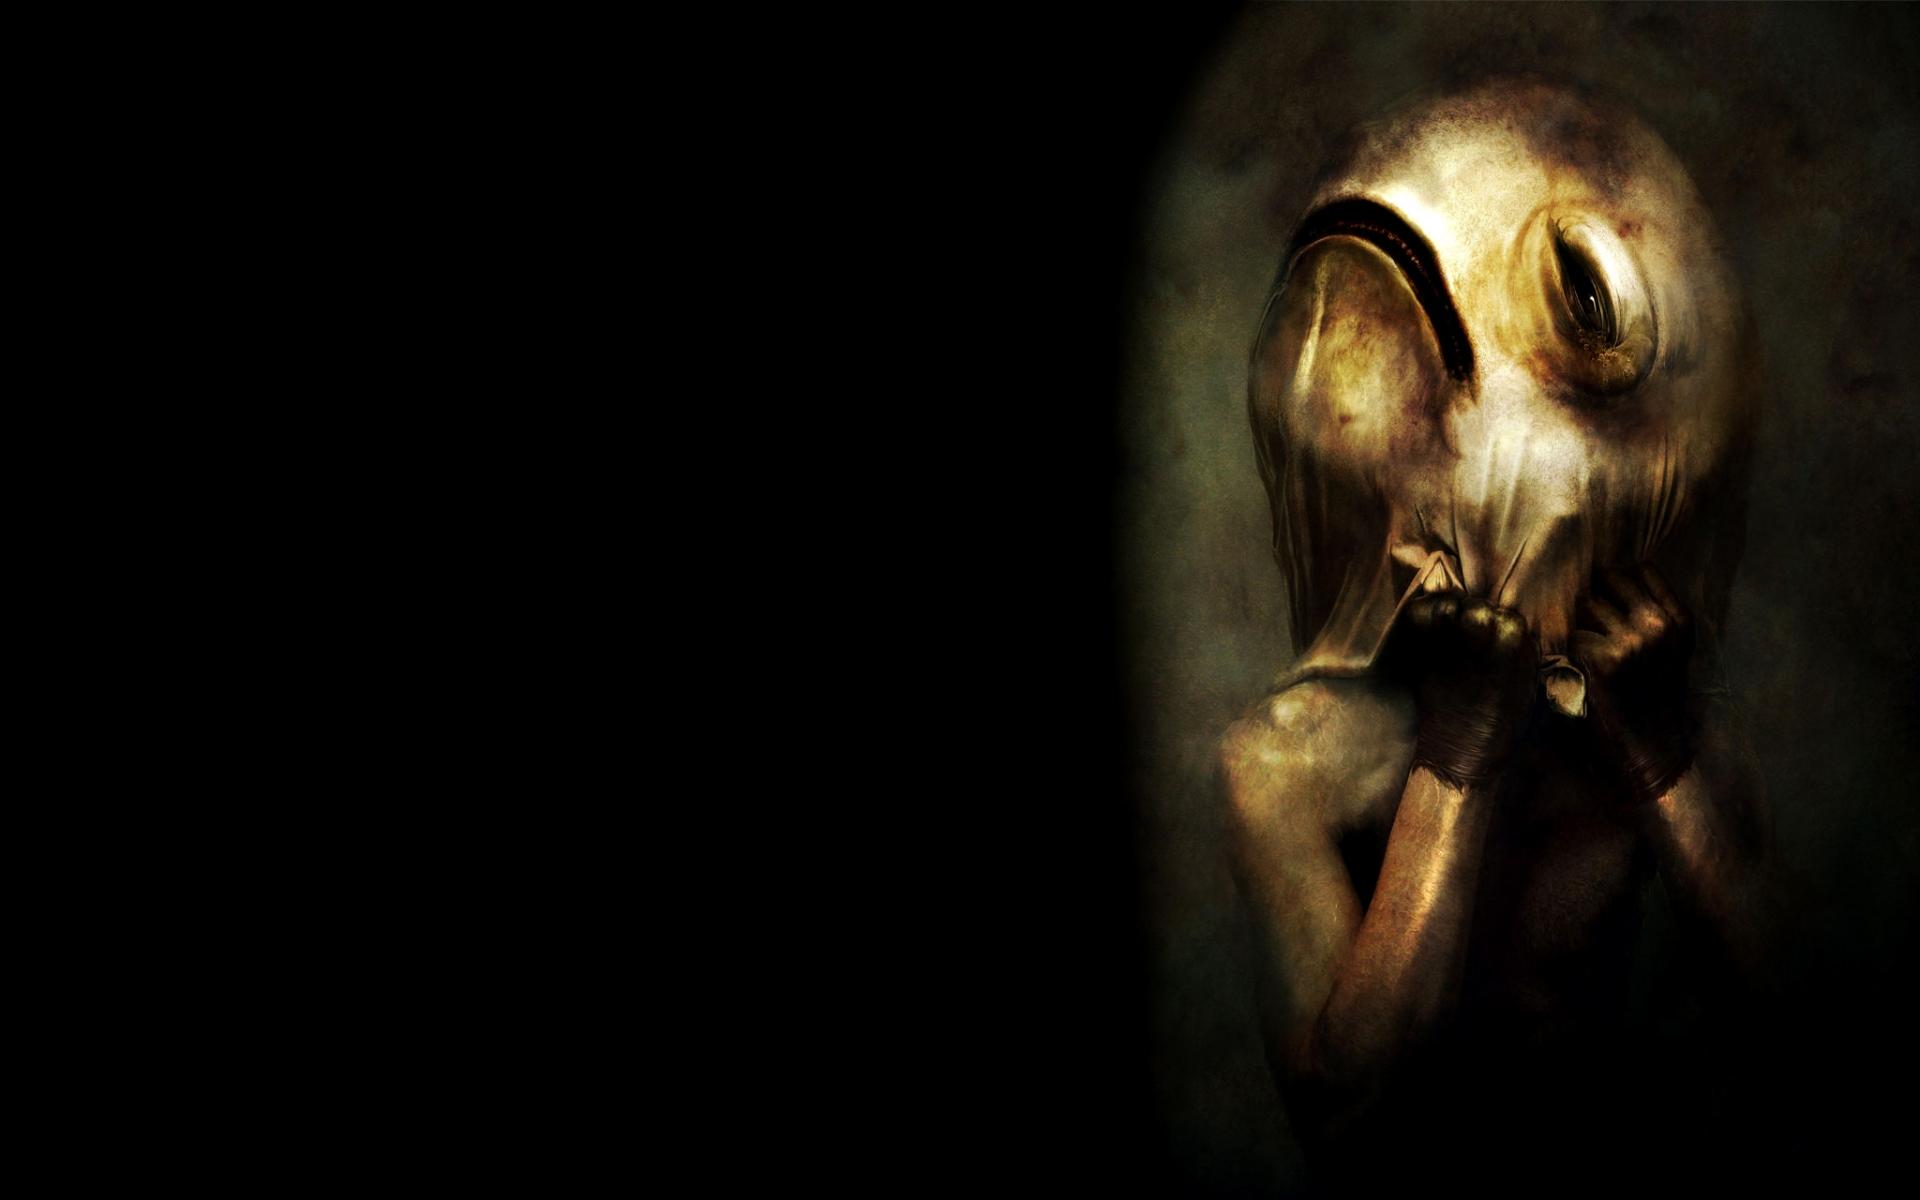 dark Horror Scary Dream Creepy Spooky Mask Macabre Art 1920x1200